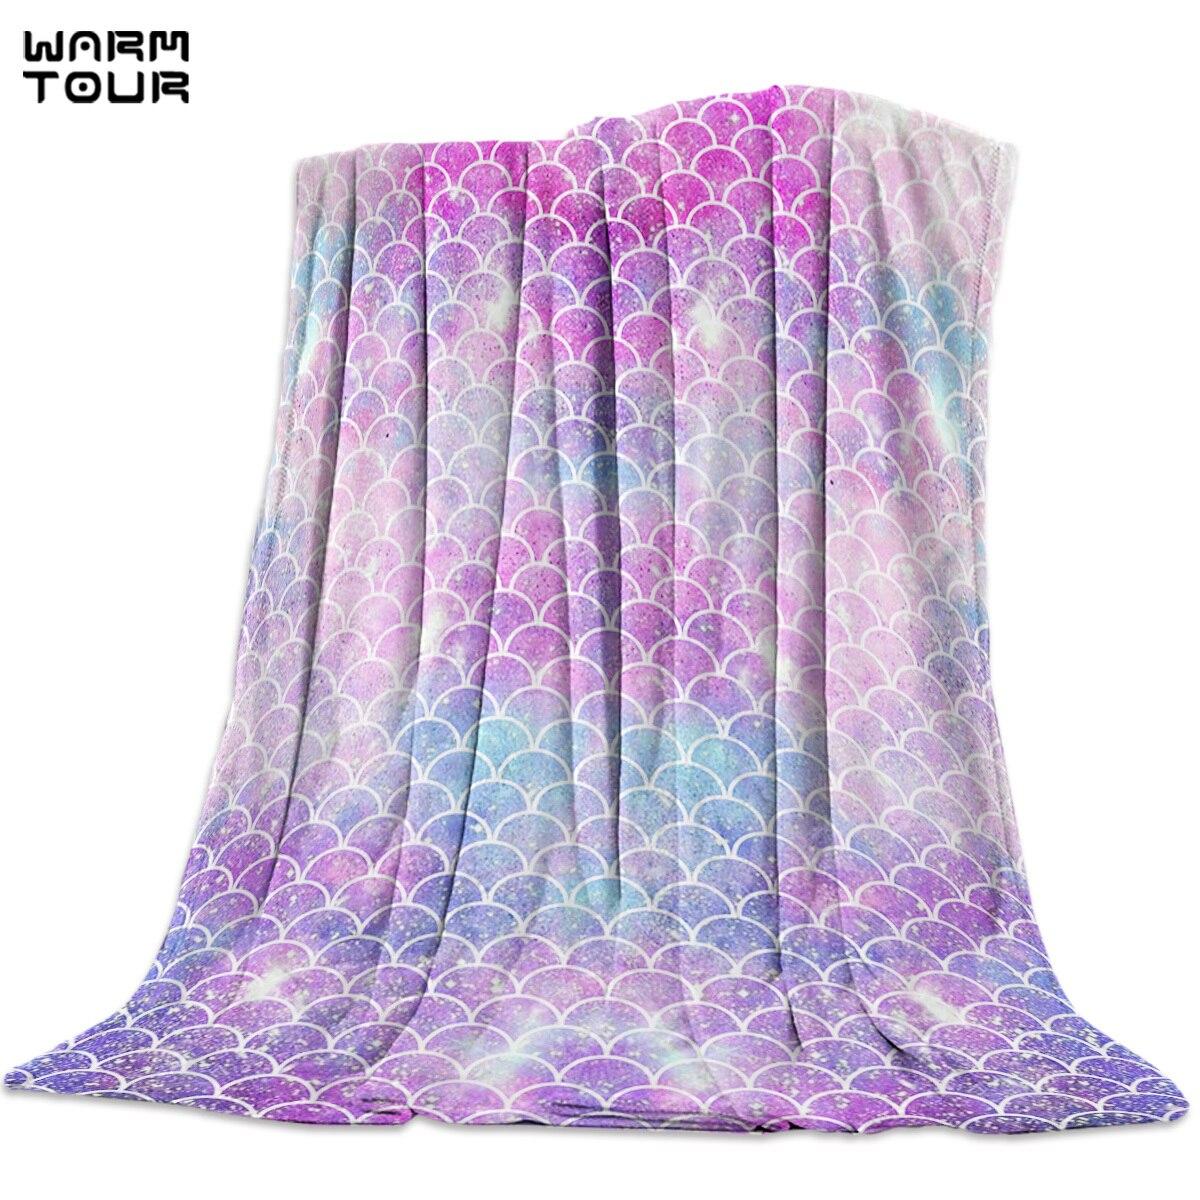 Hermosa sirena báscula colorida manta divertida impresa suave niño niña bebé Coral polar dibujos animados mantas cálido sofá cama sábanas